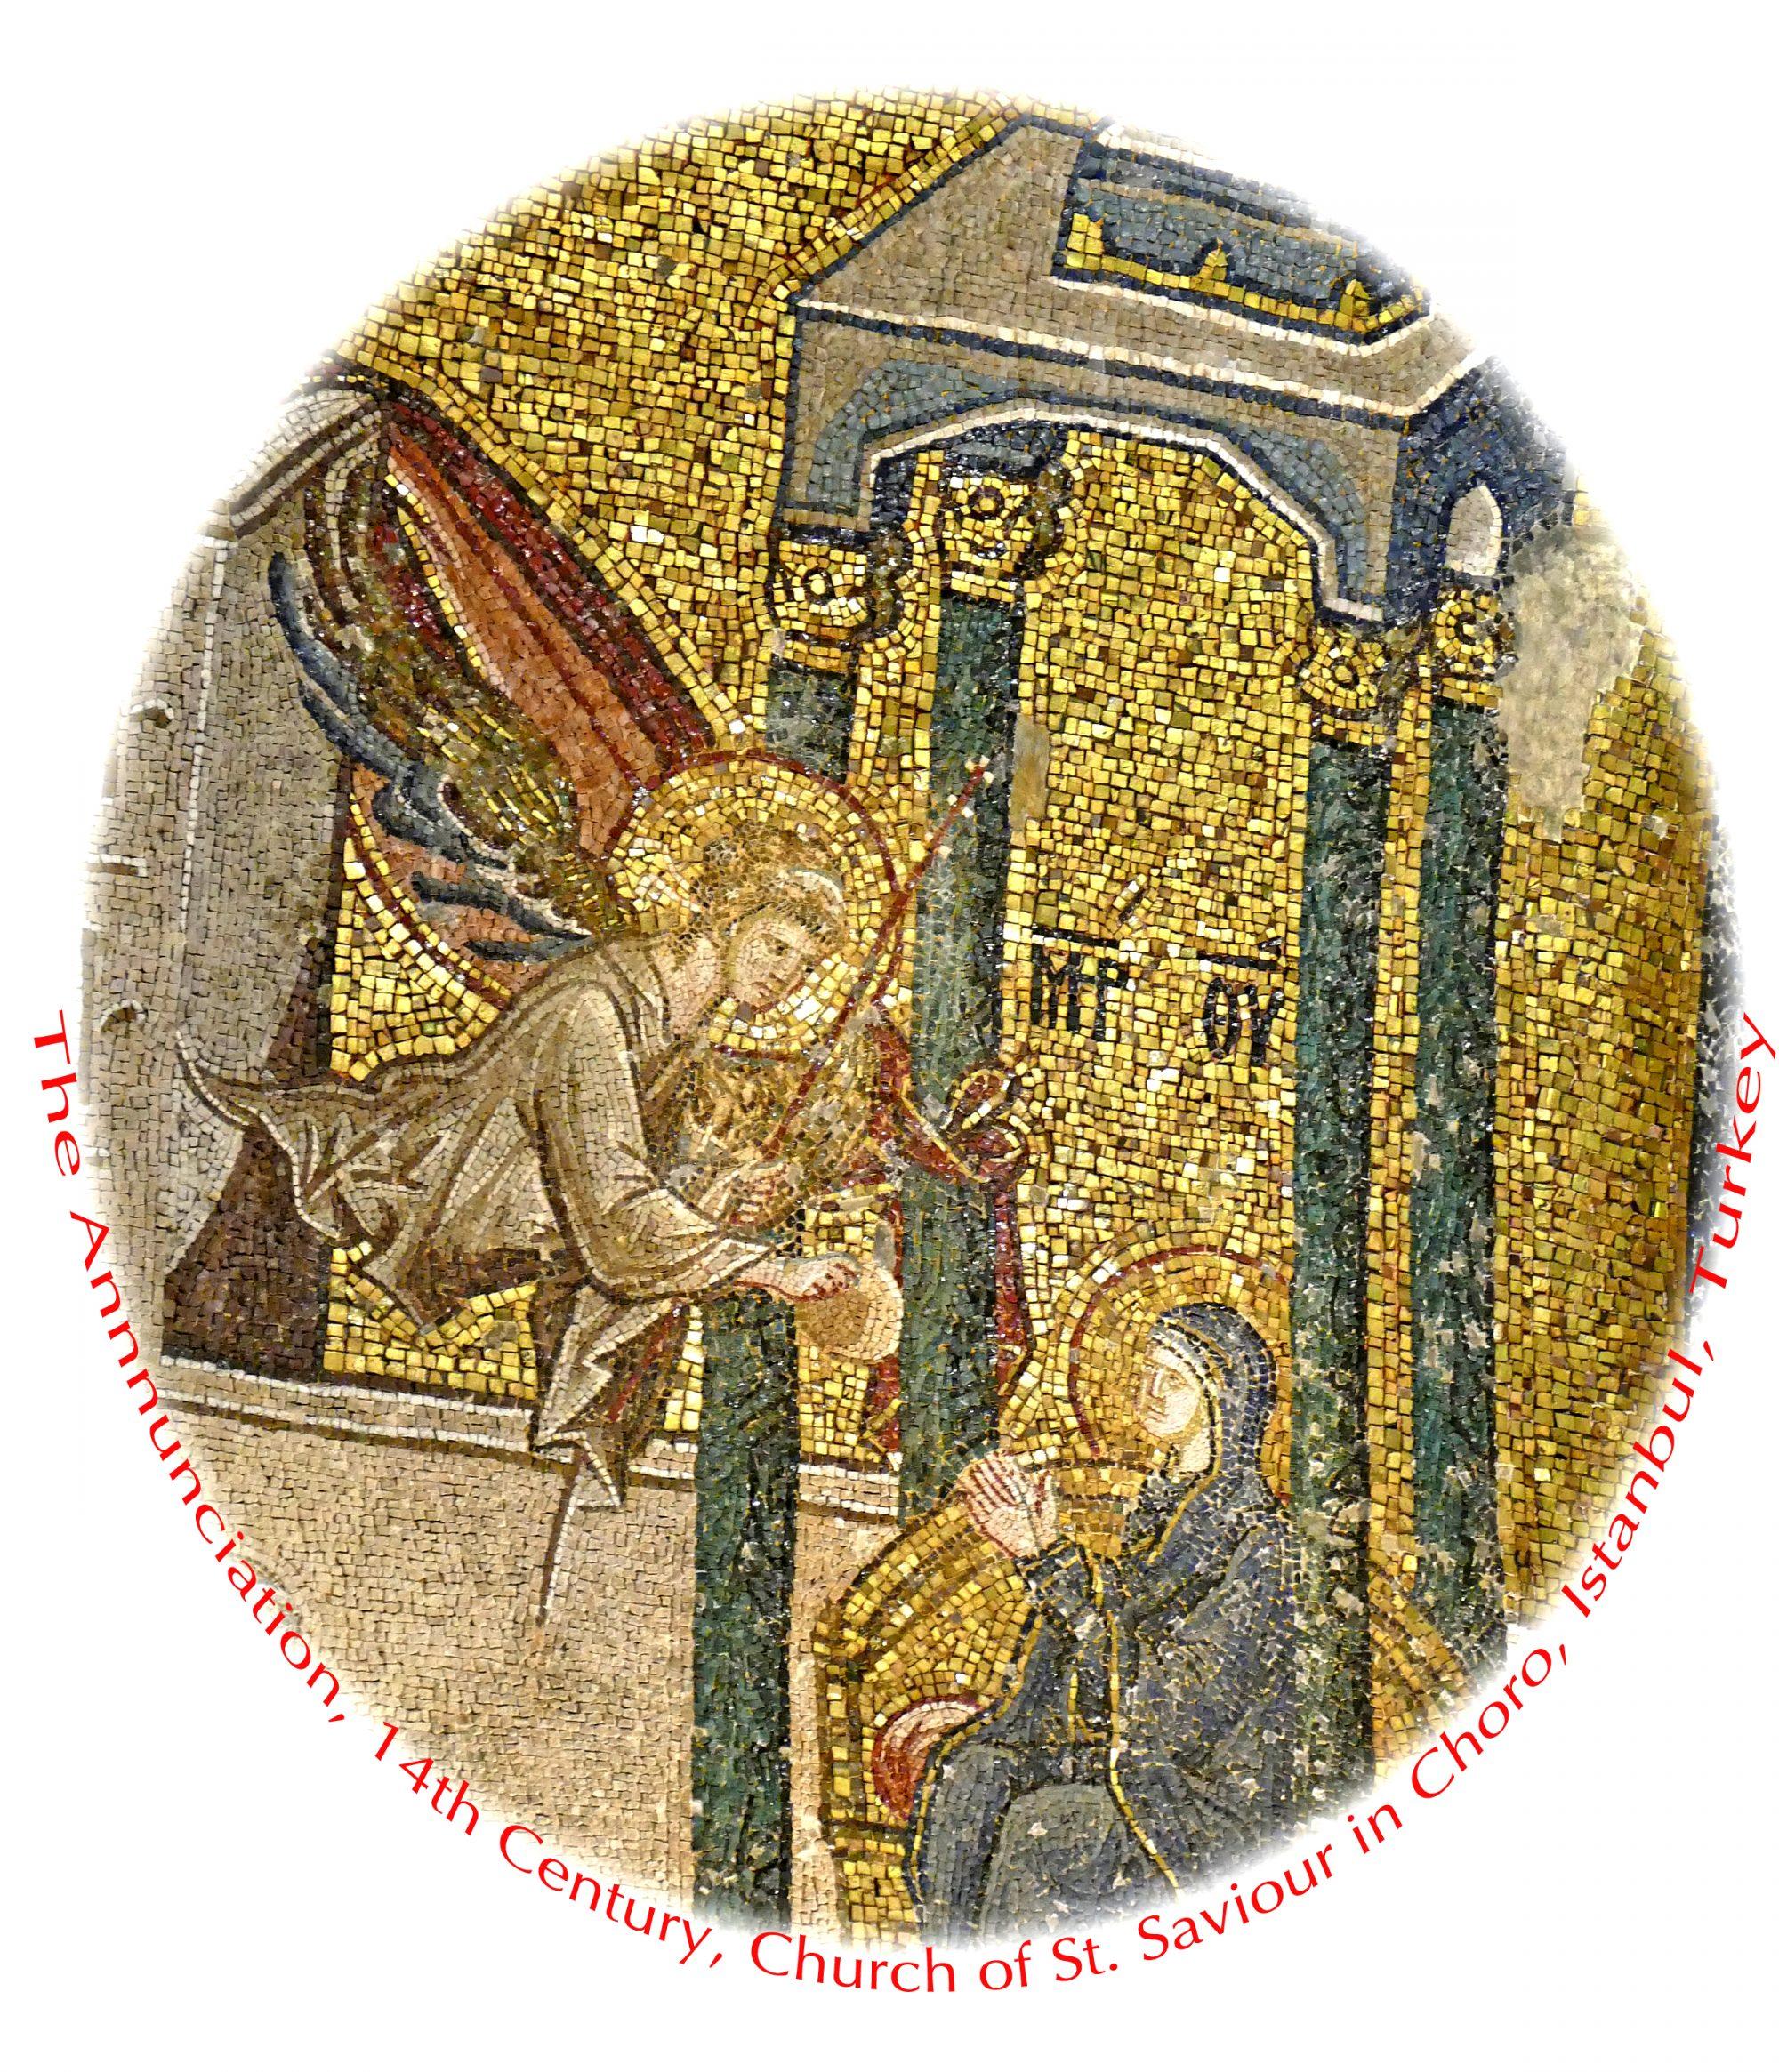 Reflections on Sunday's Mass Readings